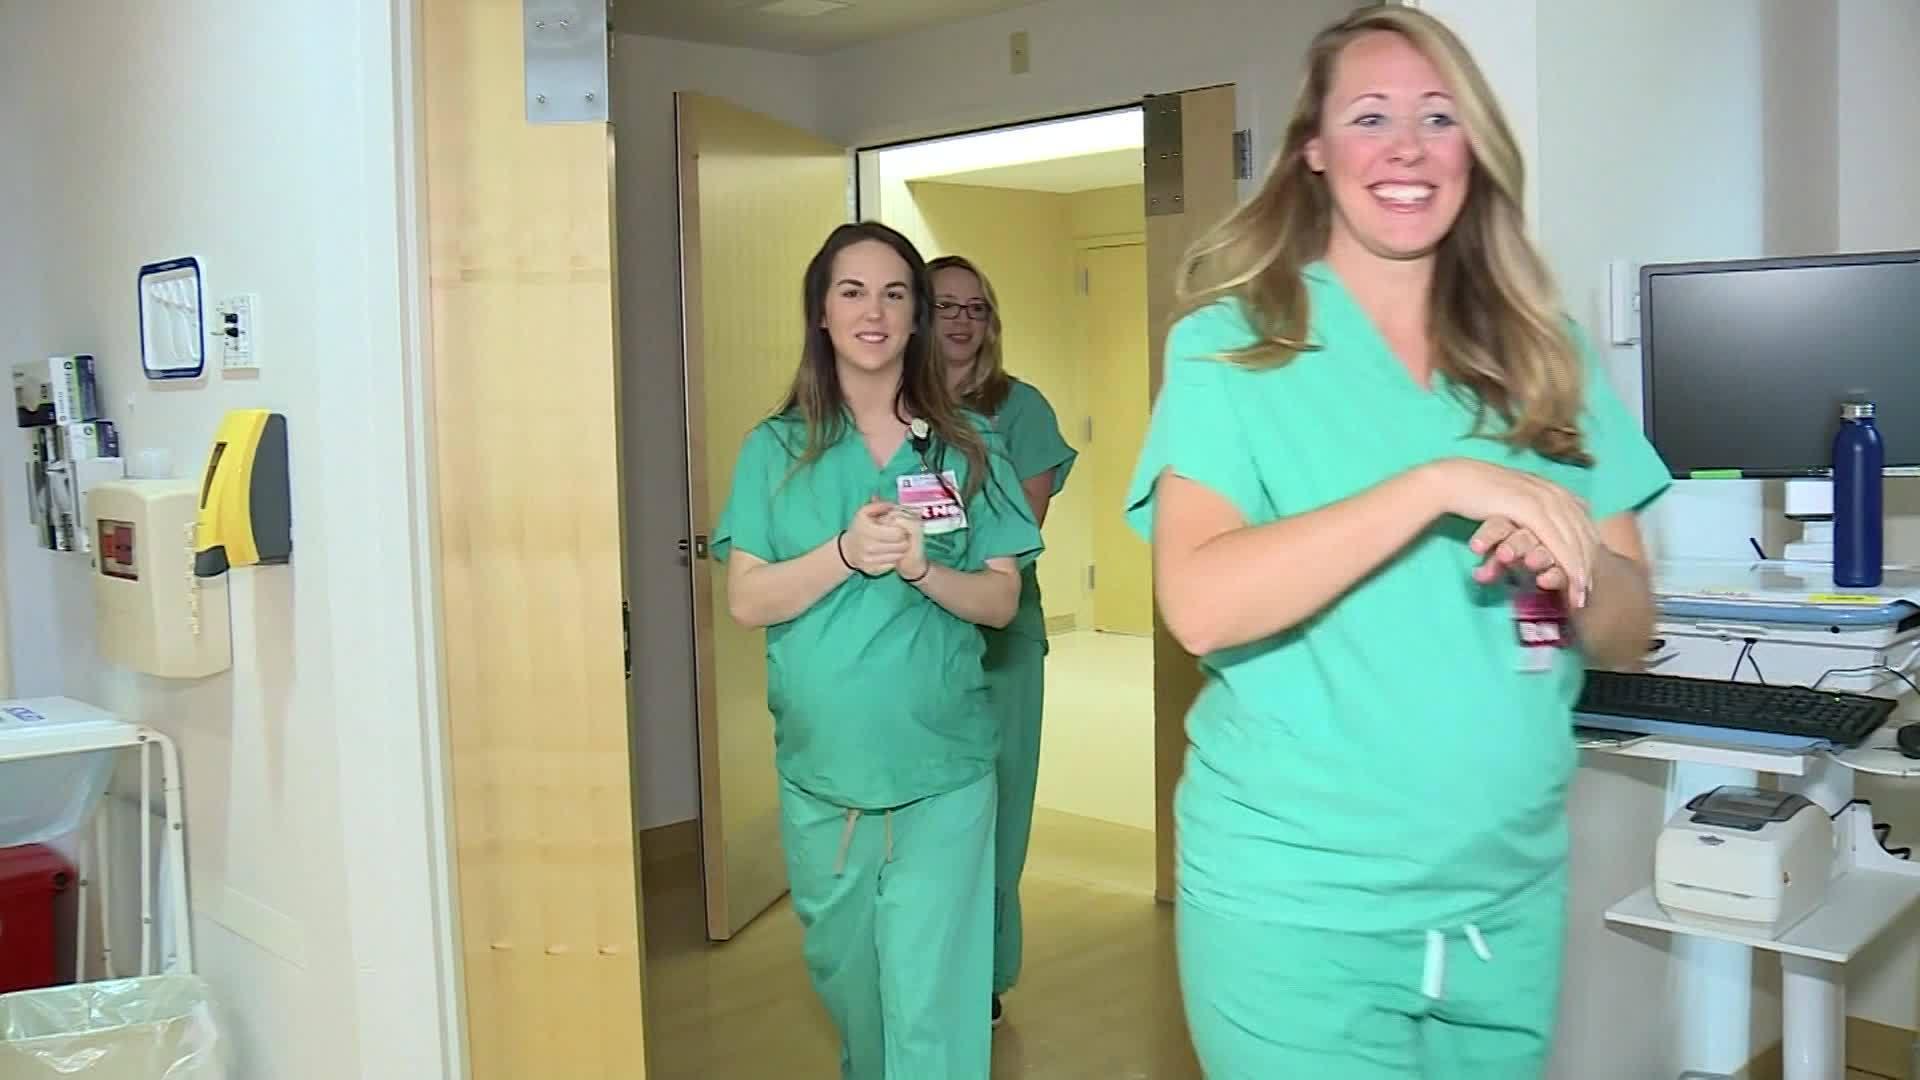 Nine_nurses_in_hospital_labor_unit_pregn_6_20190325200615